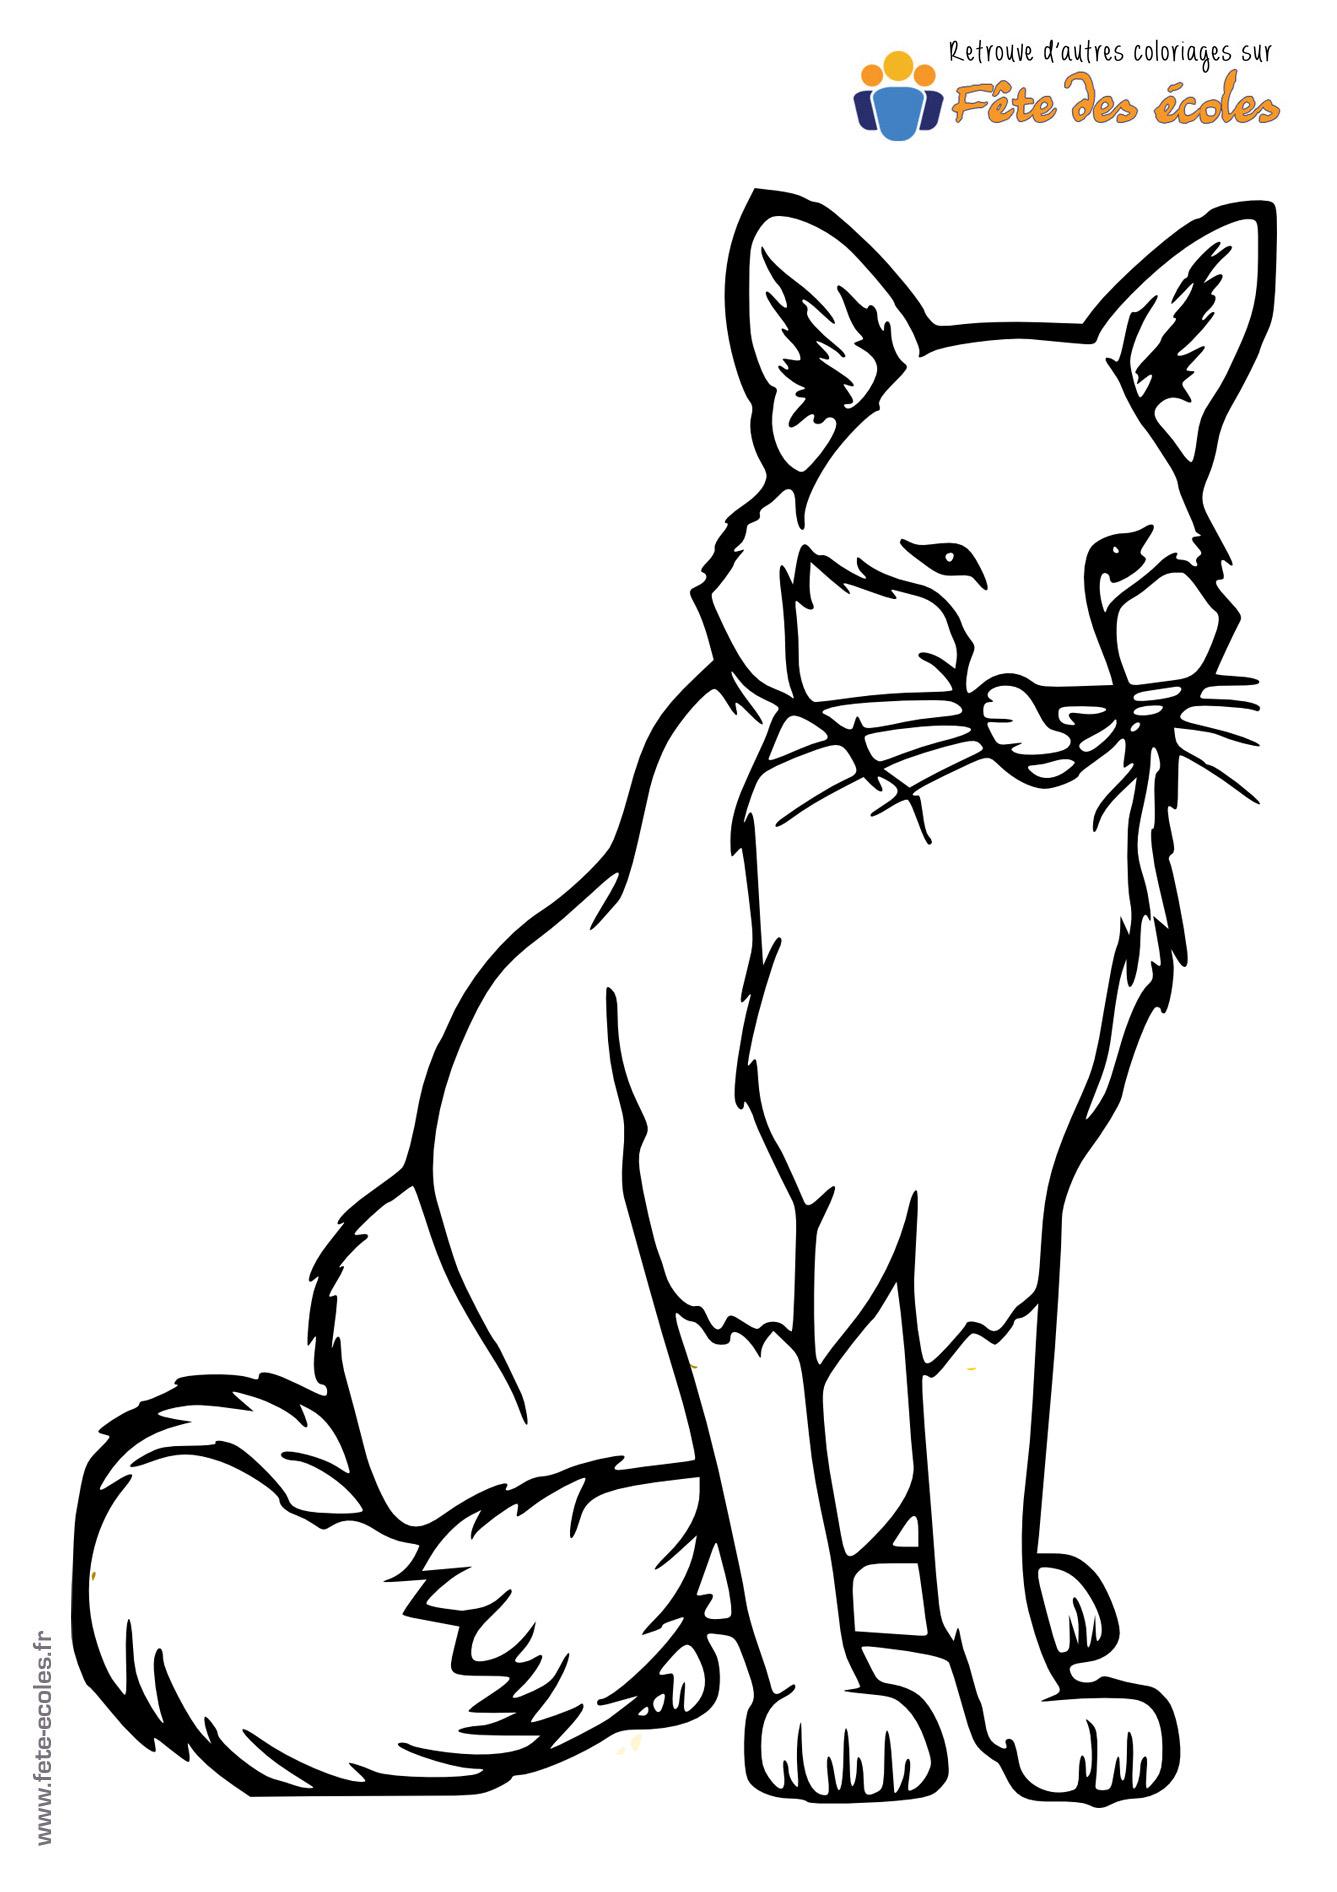 Coloriage d'un renard